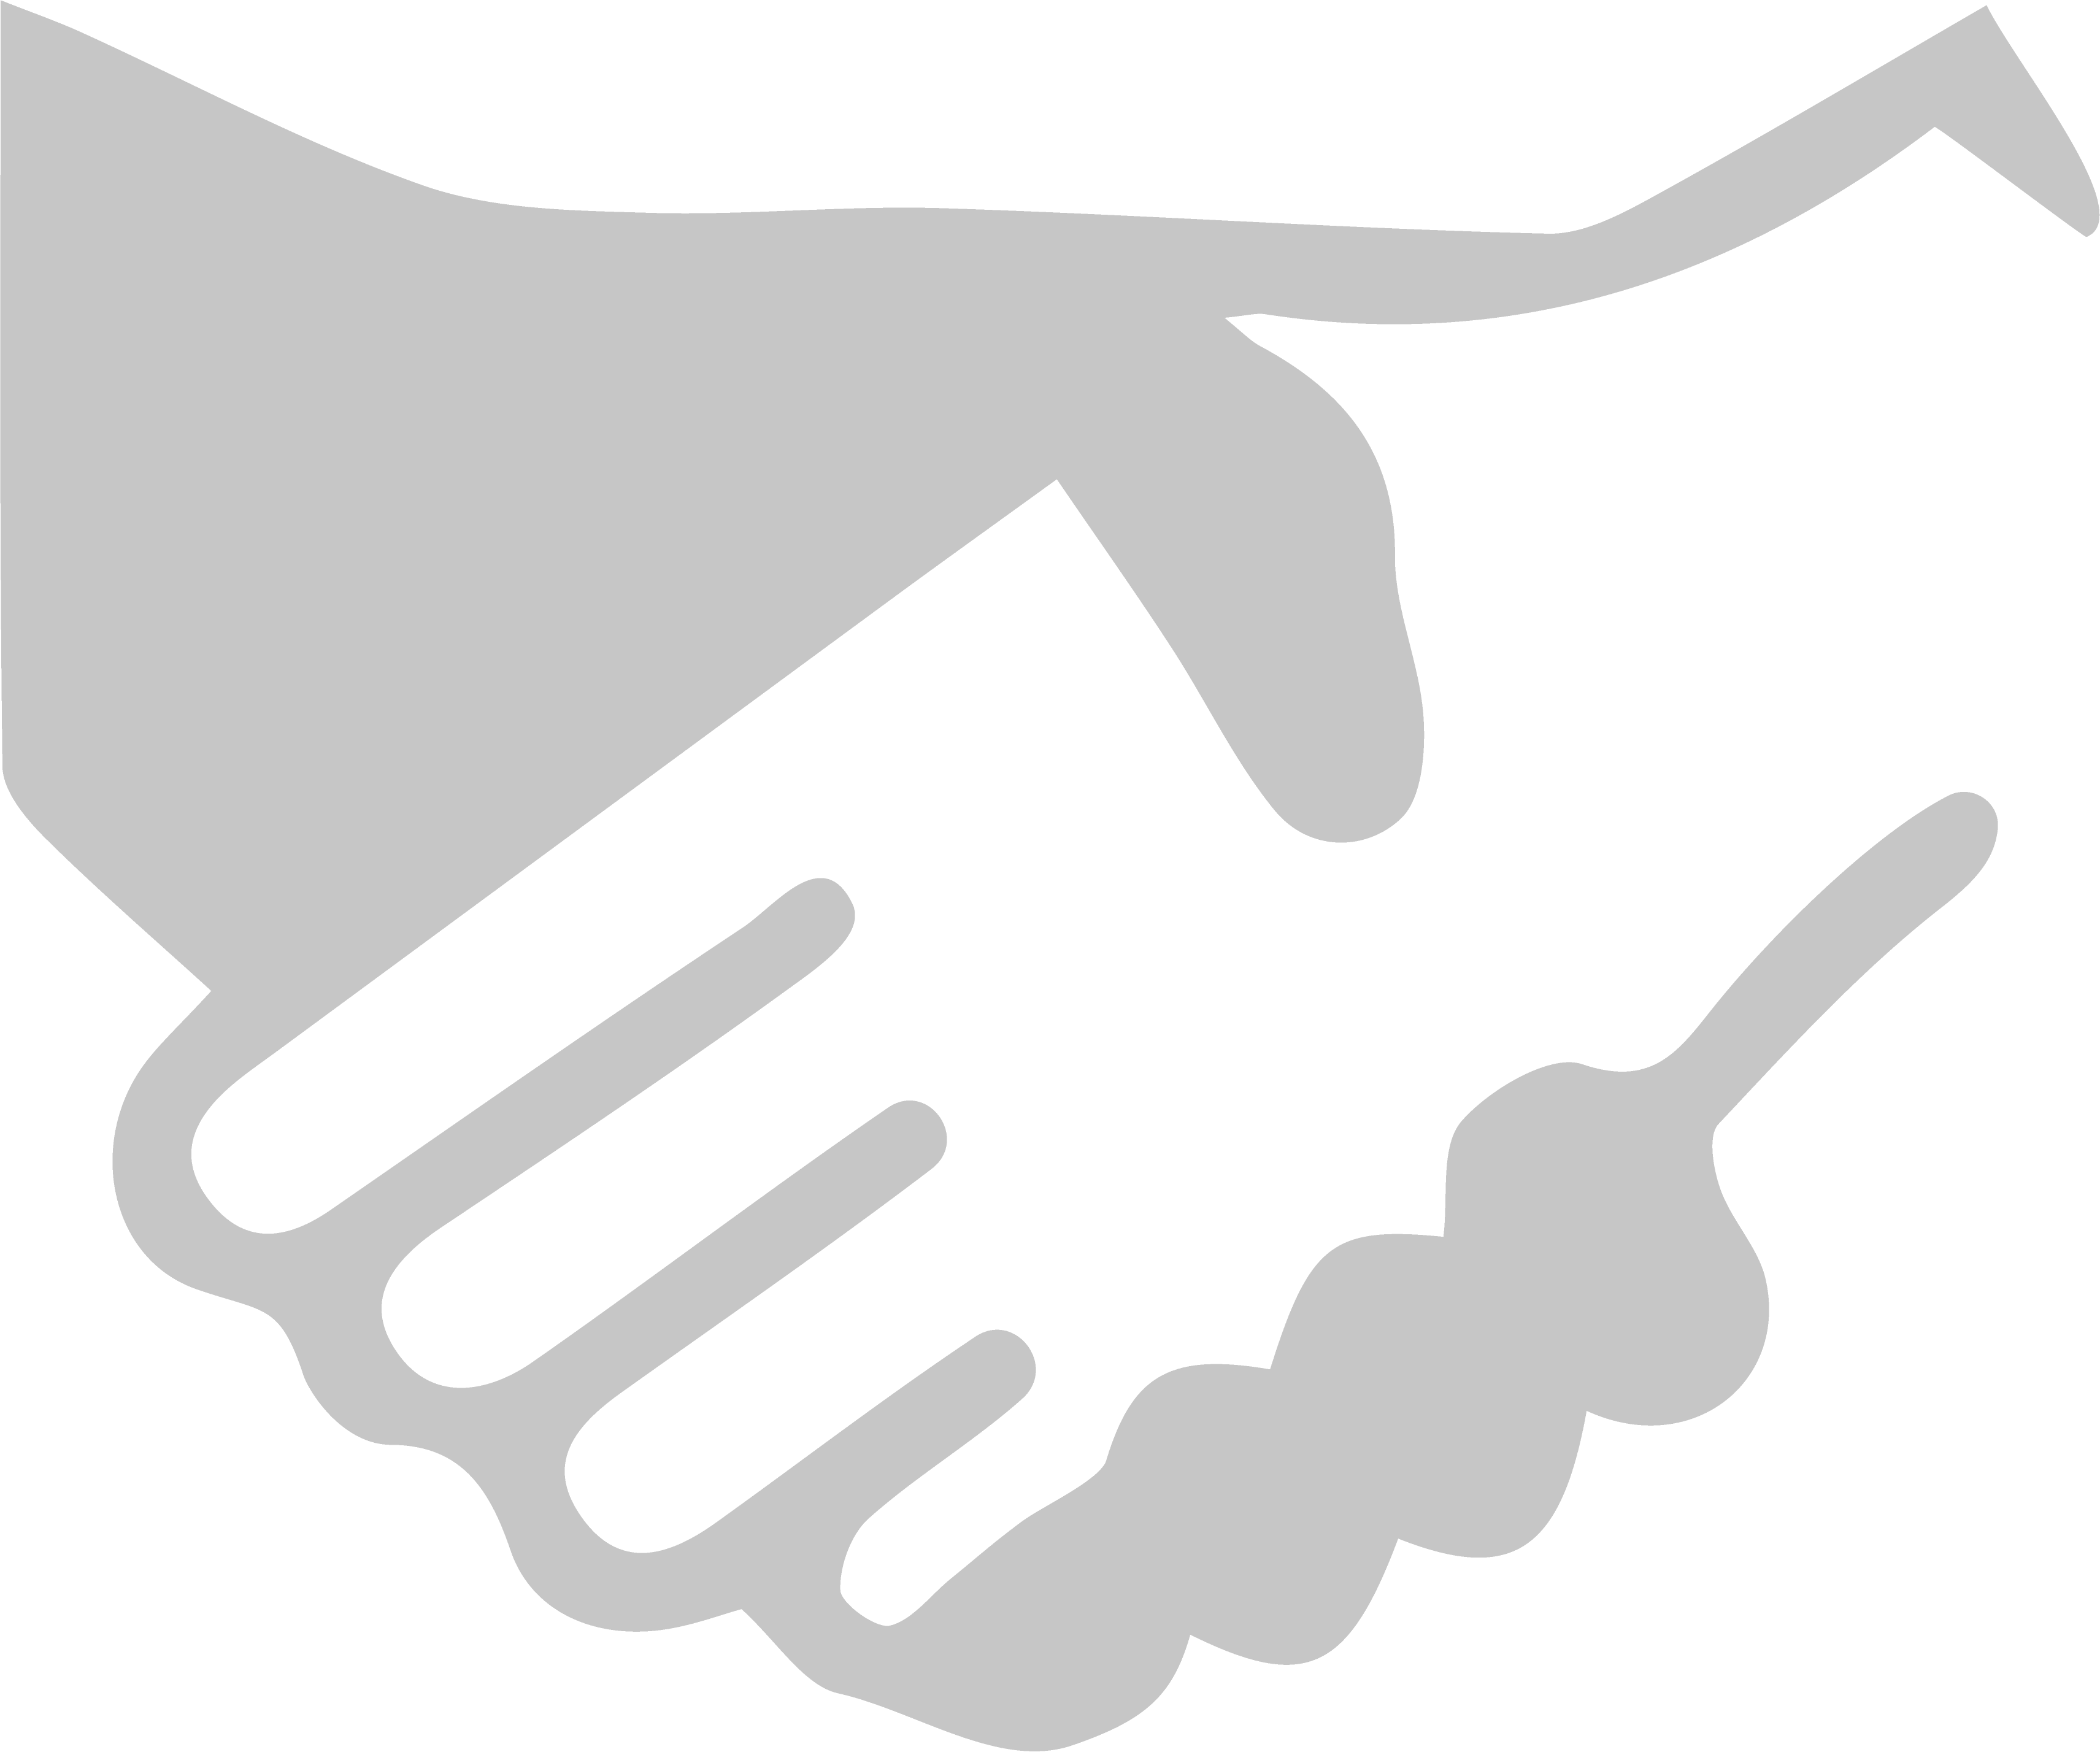 Handshake clipart sense touch. Strategy planning blueprint enterprise